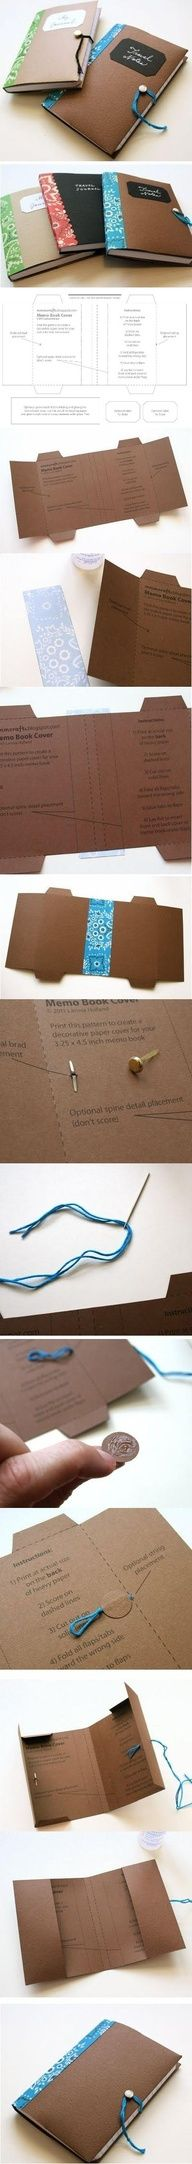 cardboard notebook cover